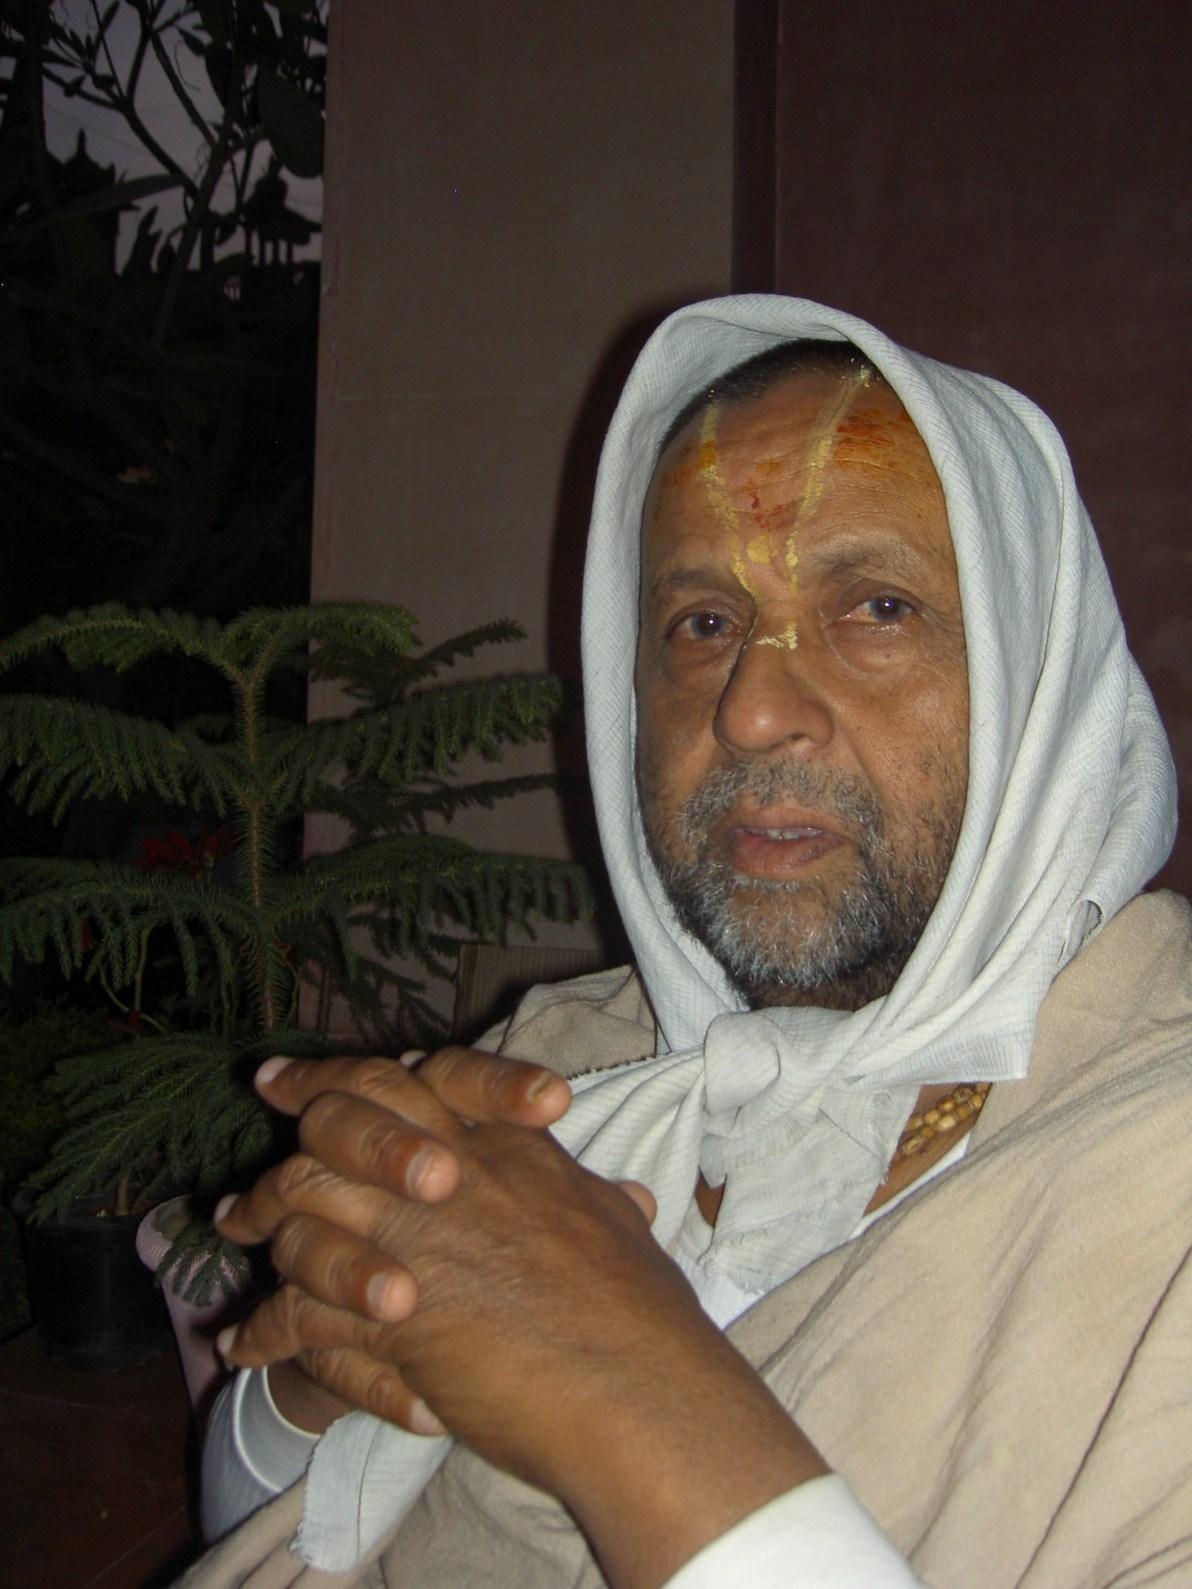 MahatmaJi